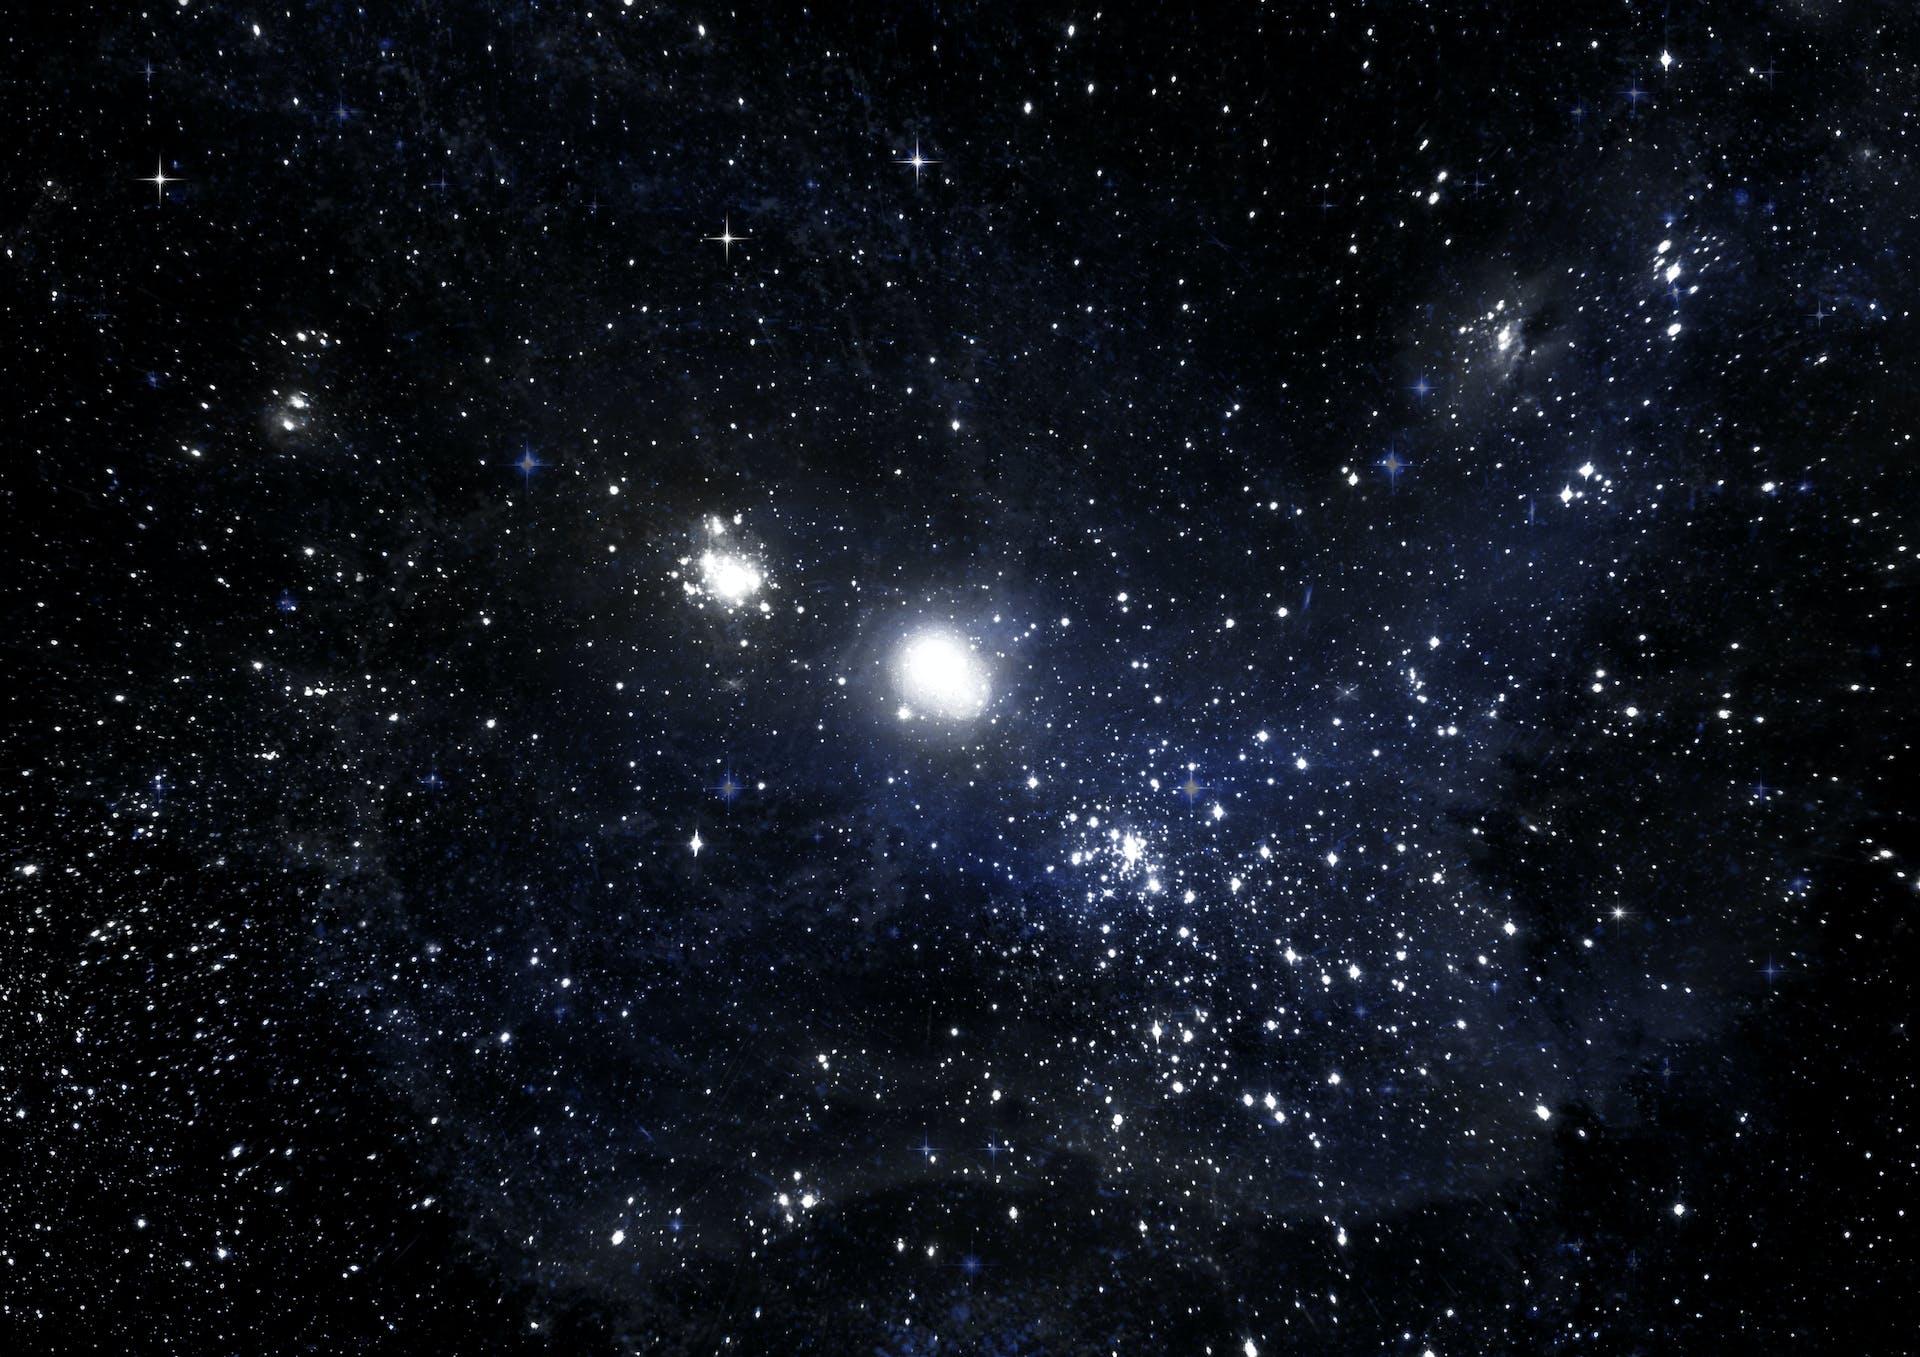 Käsitteet pimeä aine ja pimeä energia